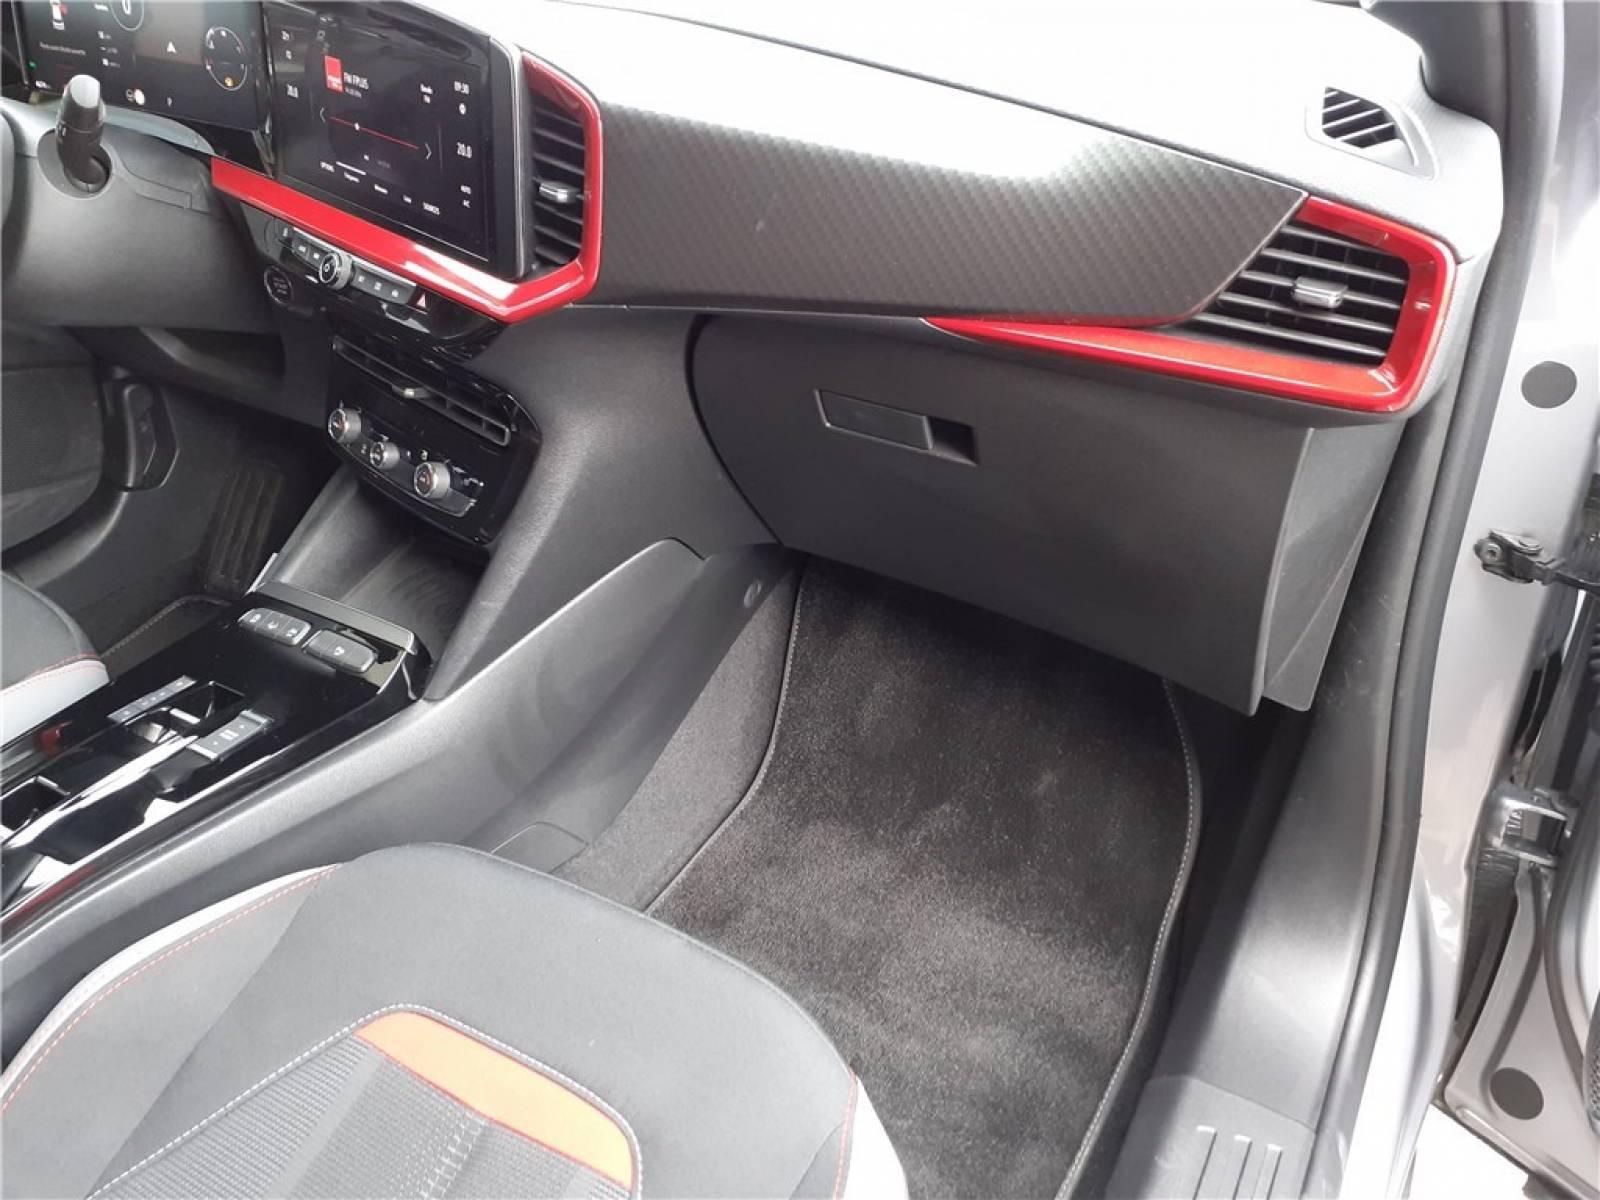 OPEL Mokka 1.2 Turbo 130 ch BVA8 - véhicule d'occasion - Groupe Guillet - Opel Magicauto - Chalon-sur-Saône - 71380 - Saint-Marcel - 58